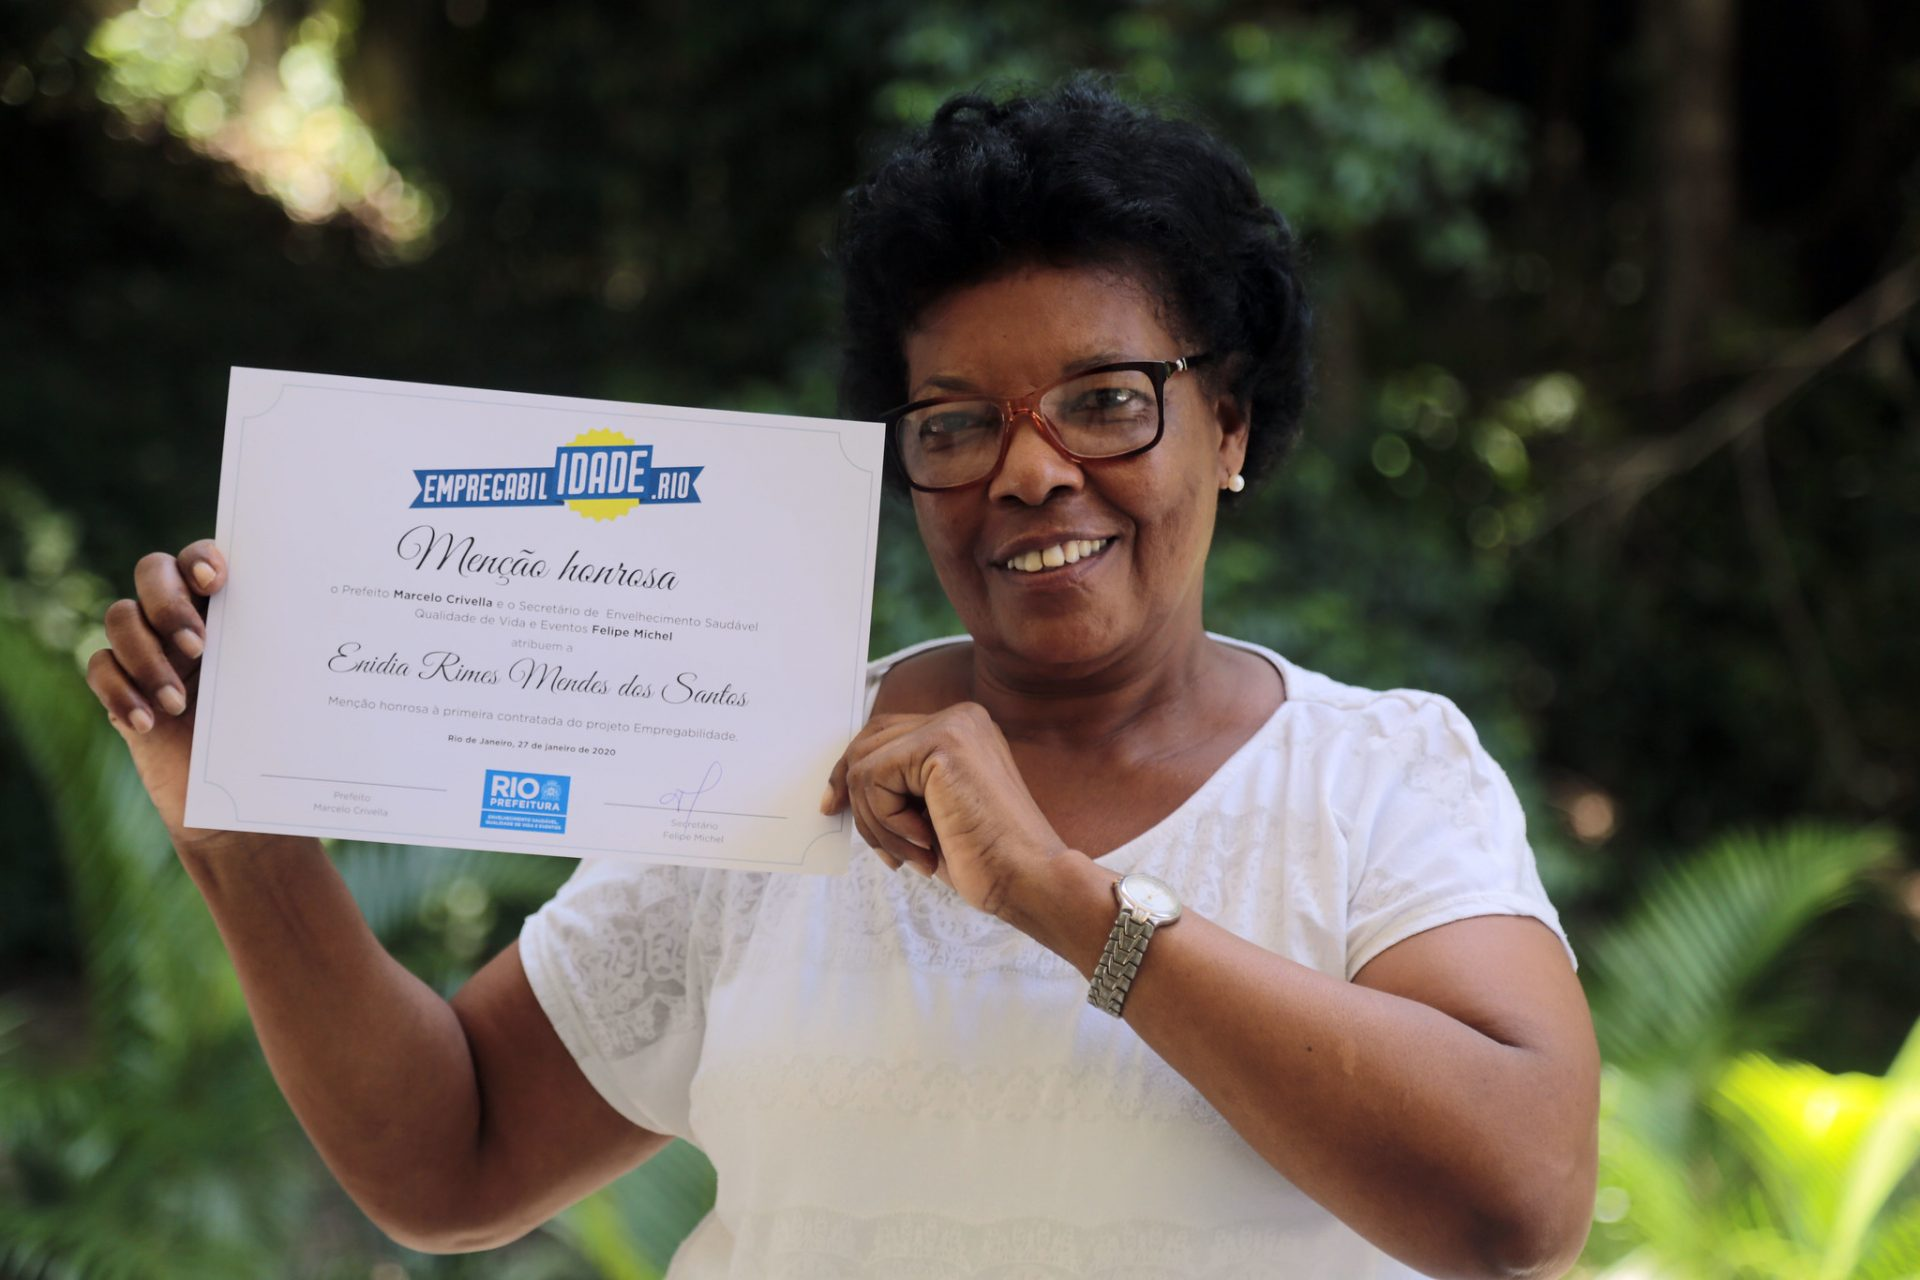 Enídia Rimes Mendes, de 66 anos, voltou ao mercado depois de dois anos desempregada. Foto: Marcos de Paula / Prefeitura do Rio